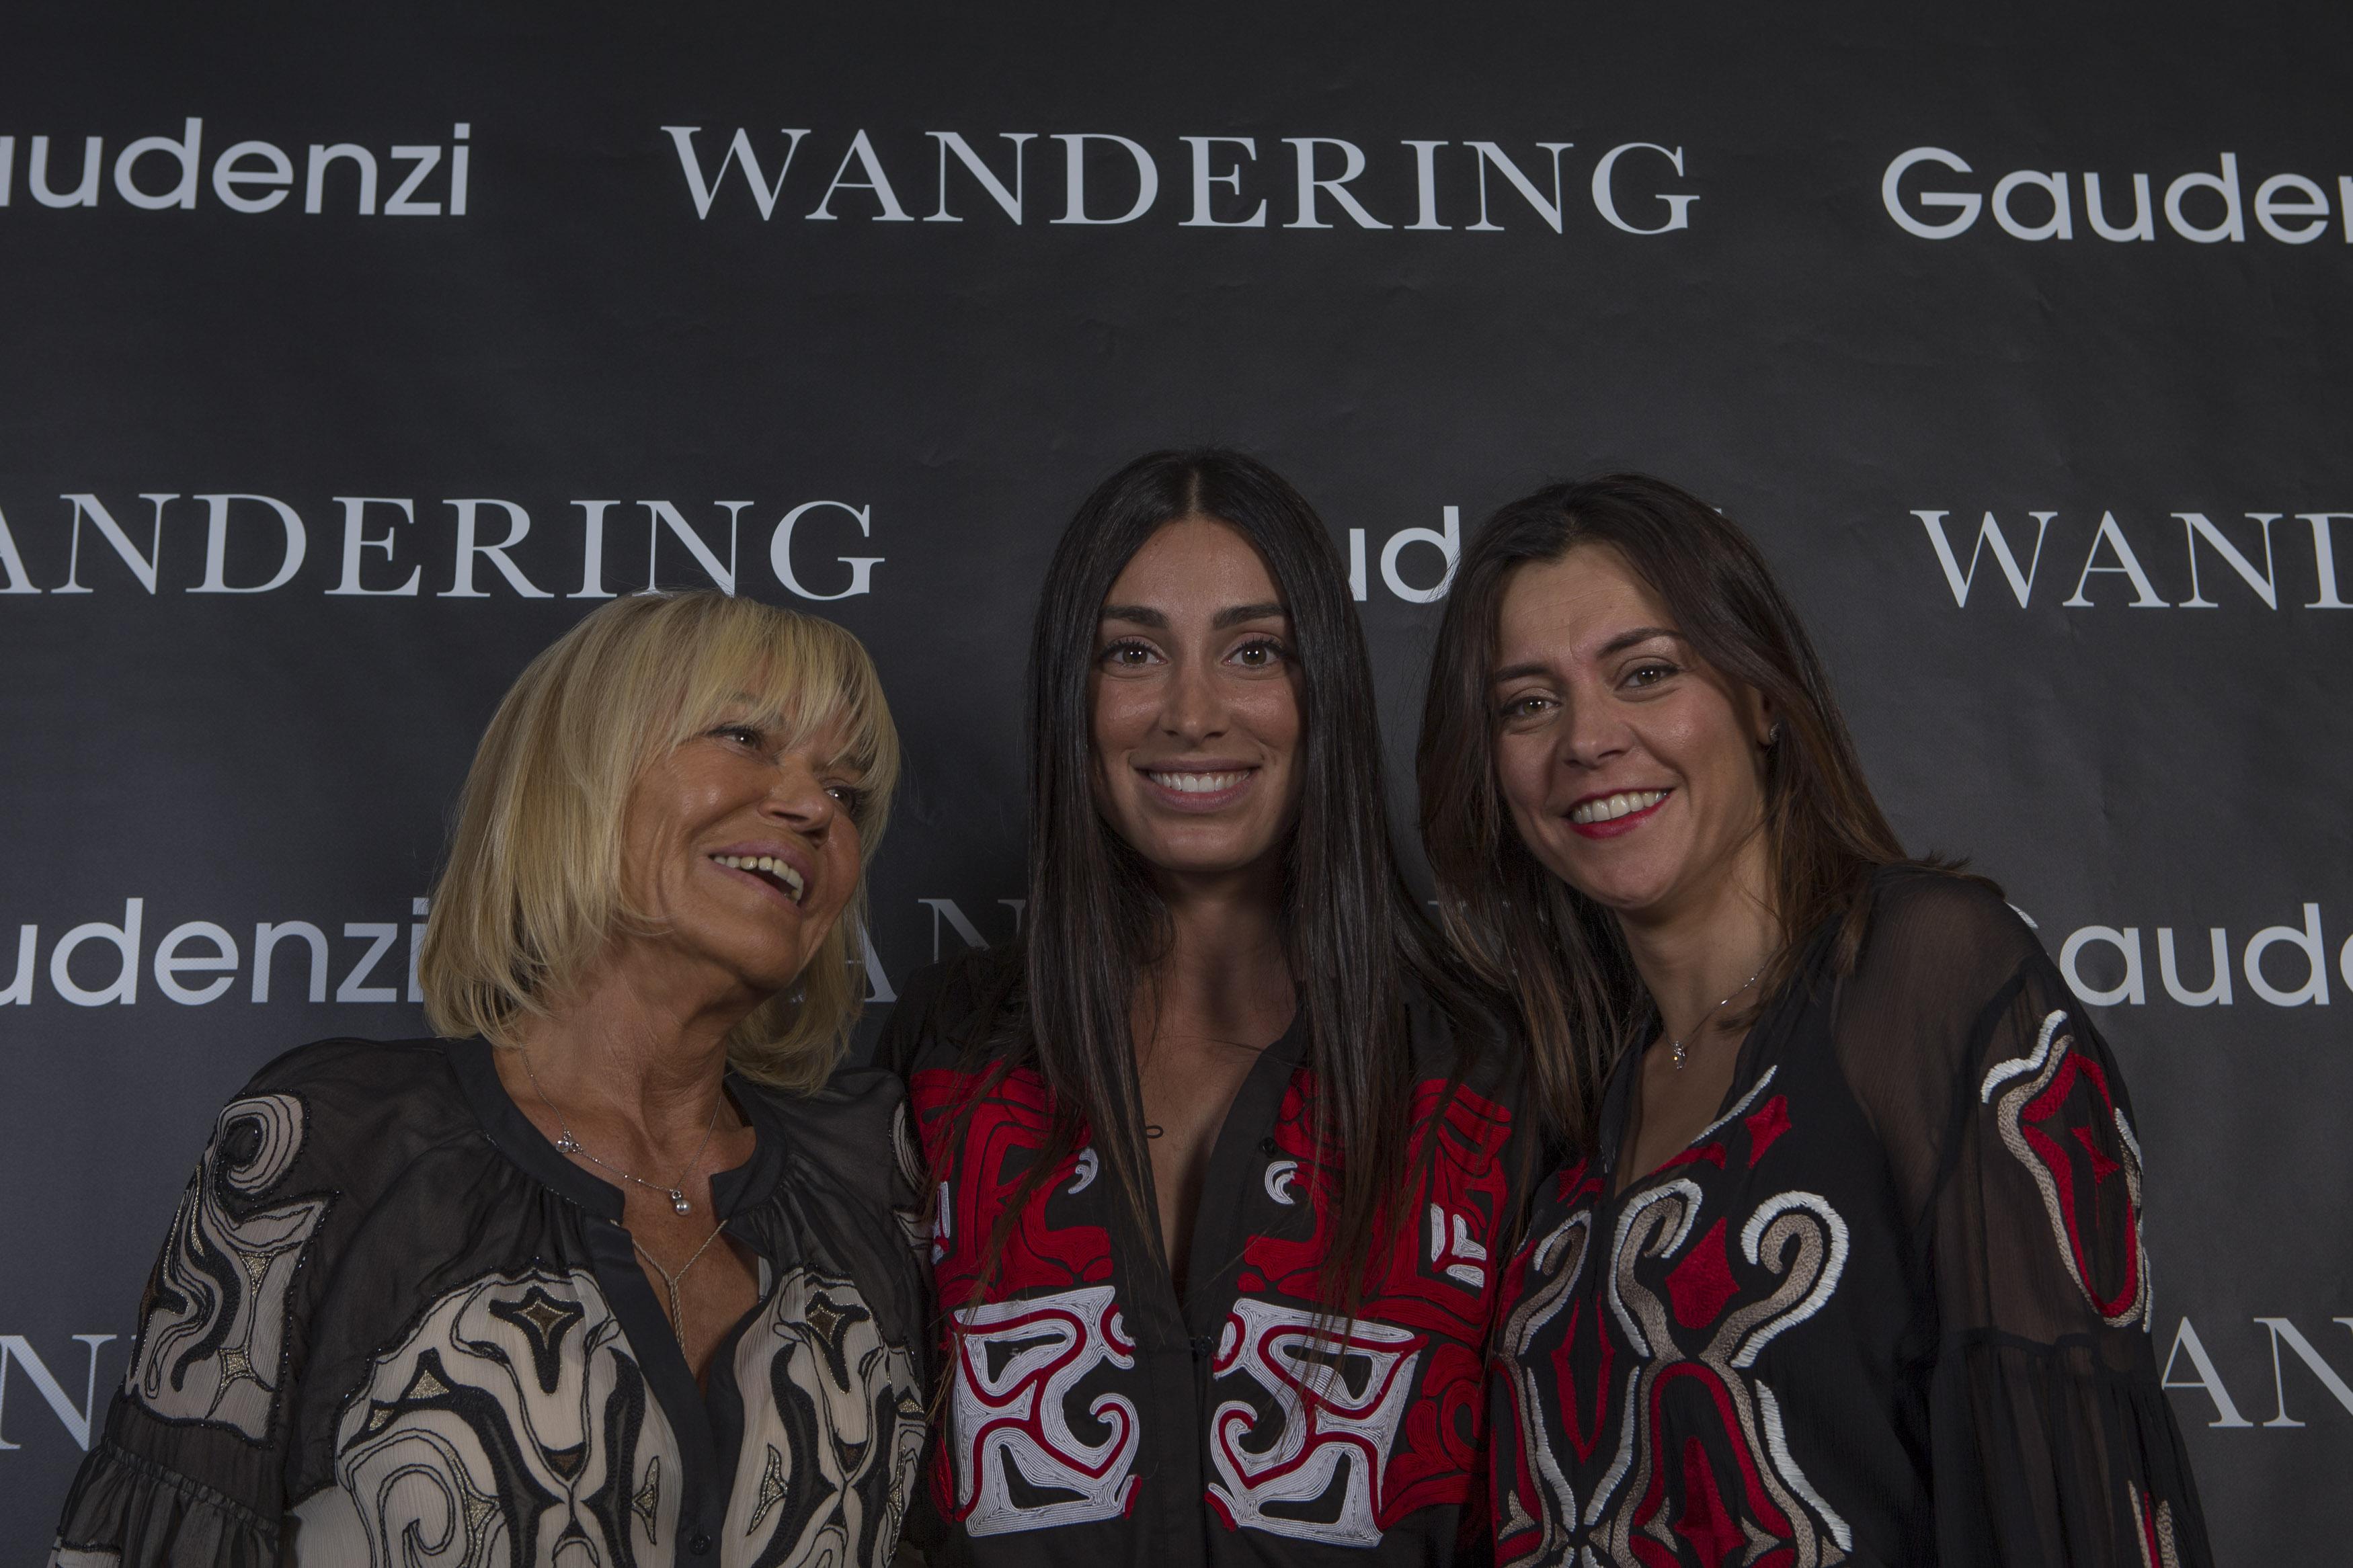 Giorgia Gabriele + Gaudenzi